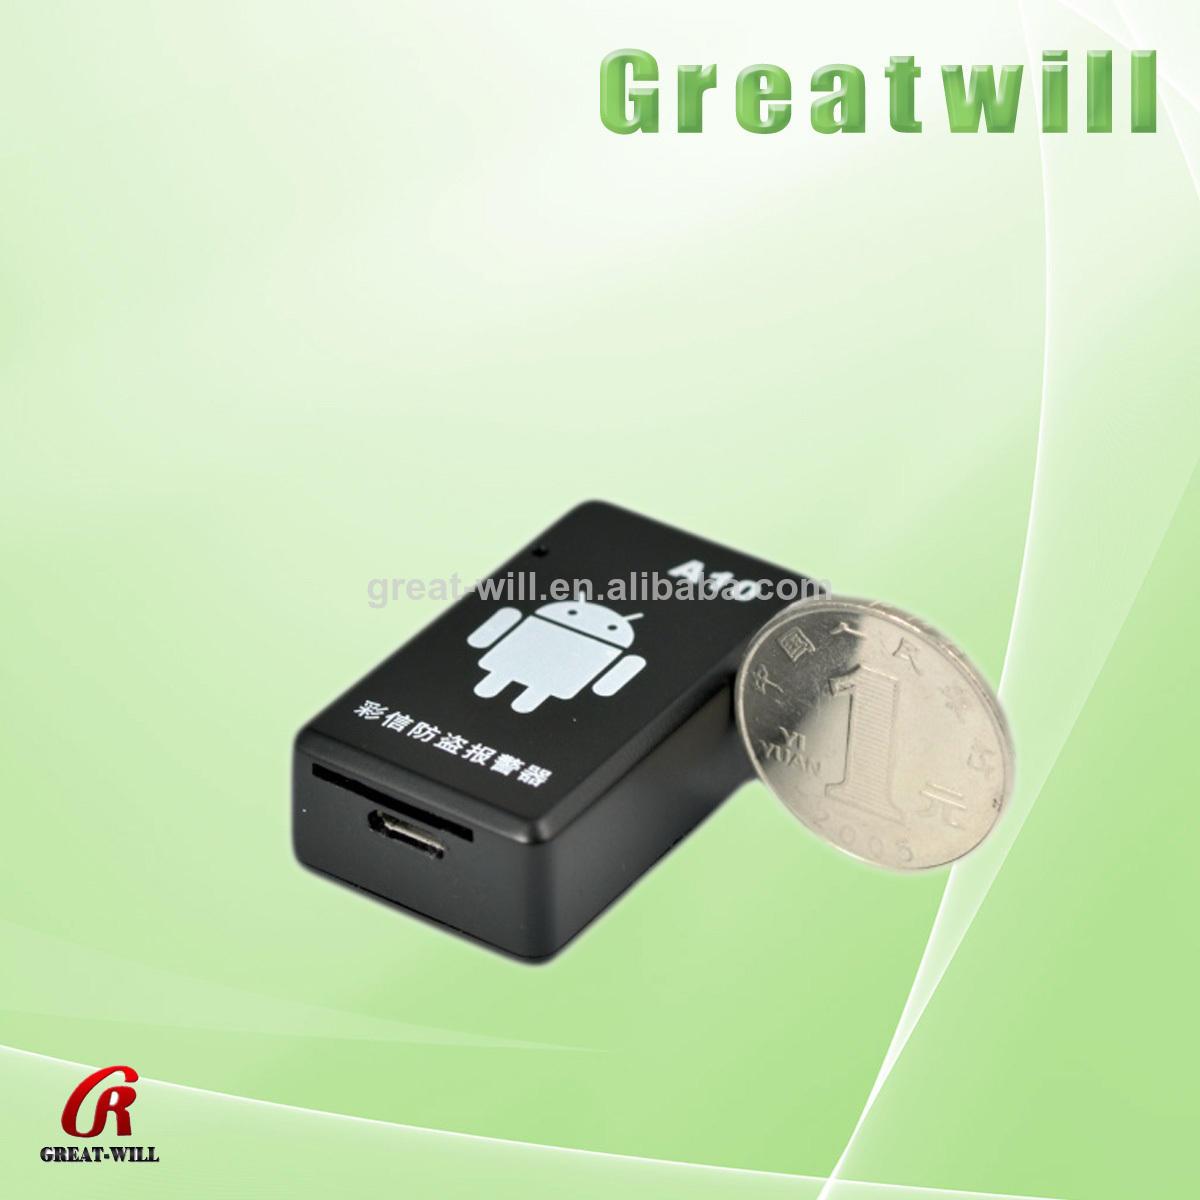 mms de alarma eléctrica micro modelo gsm gps tracker